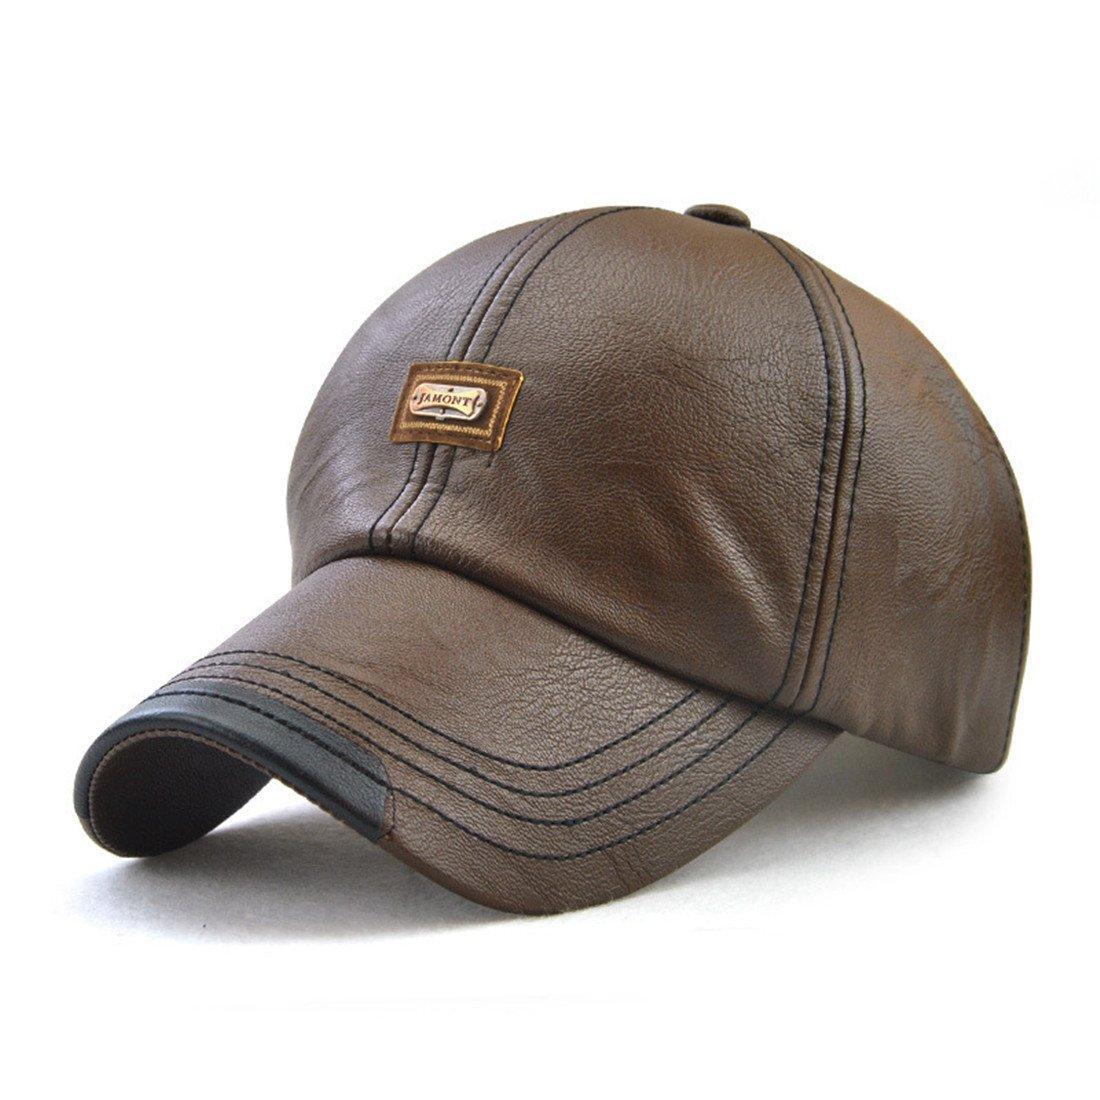 Roffatide Men's PU Leather Baseball Cap Dad Hat Strapback Autumn and Winter RT3022-1